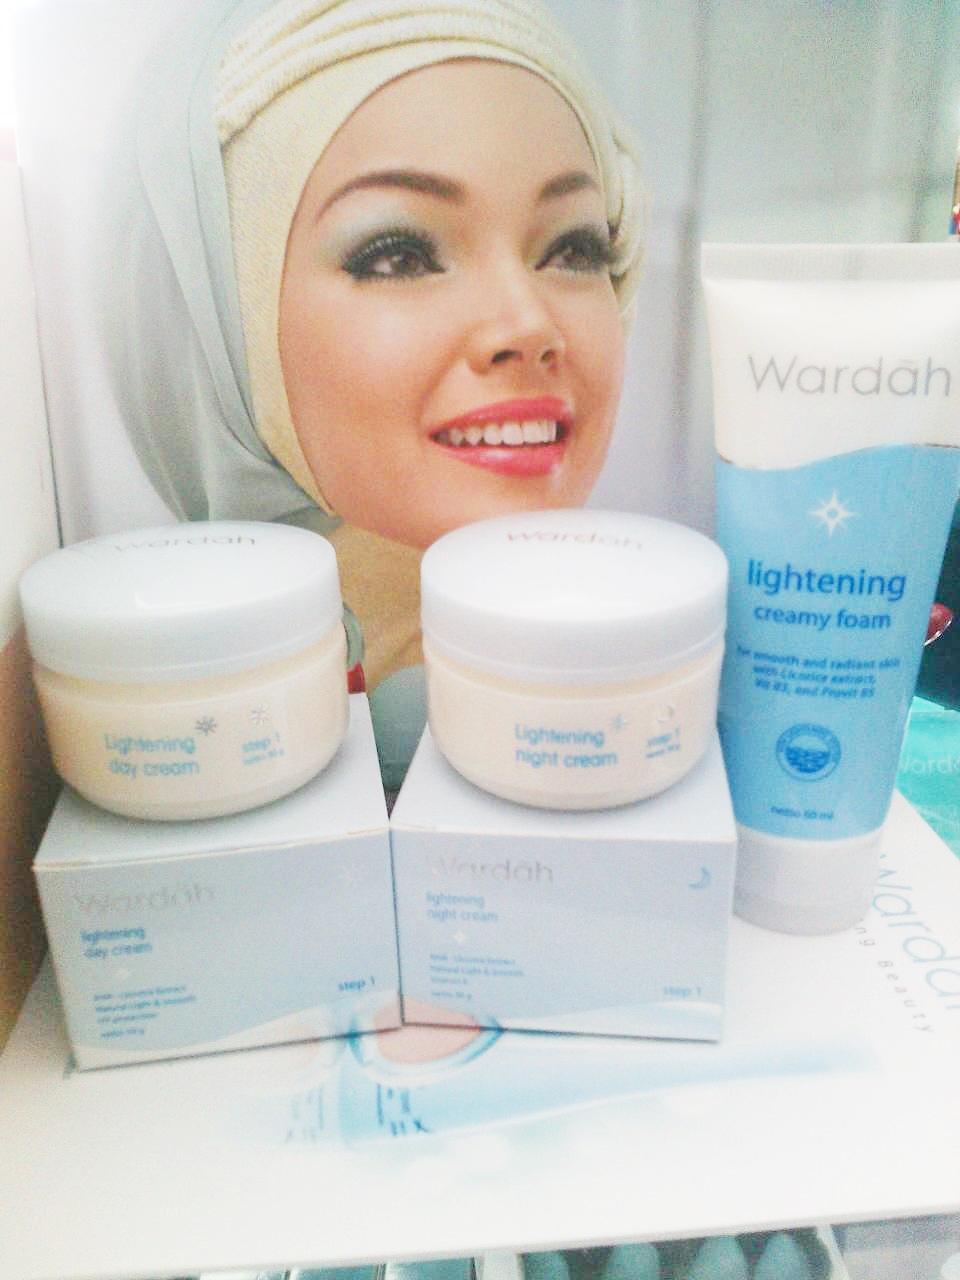 Jual Wardah Lightening Series Step 2 Paket Hemat Store Creamy Foam Tokopedia